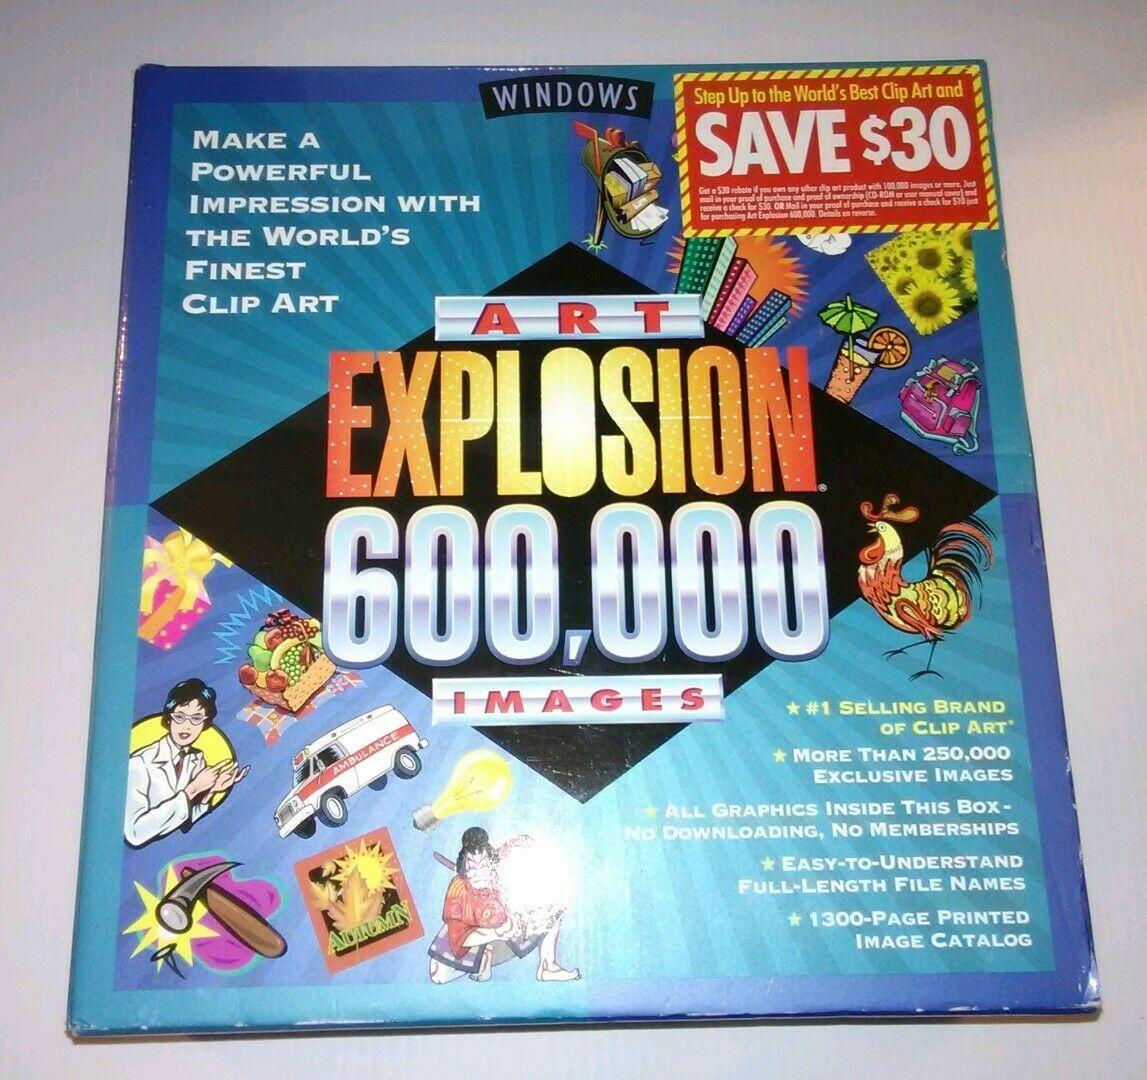 ART EXPLOSION 600,000 Images / Clip Art Software PC WINDOWS = 17 GB / 29  CD.